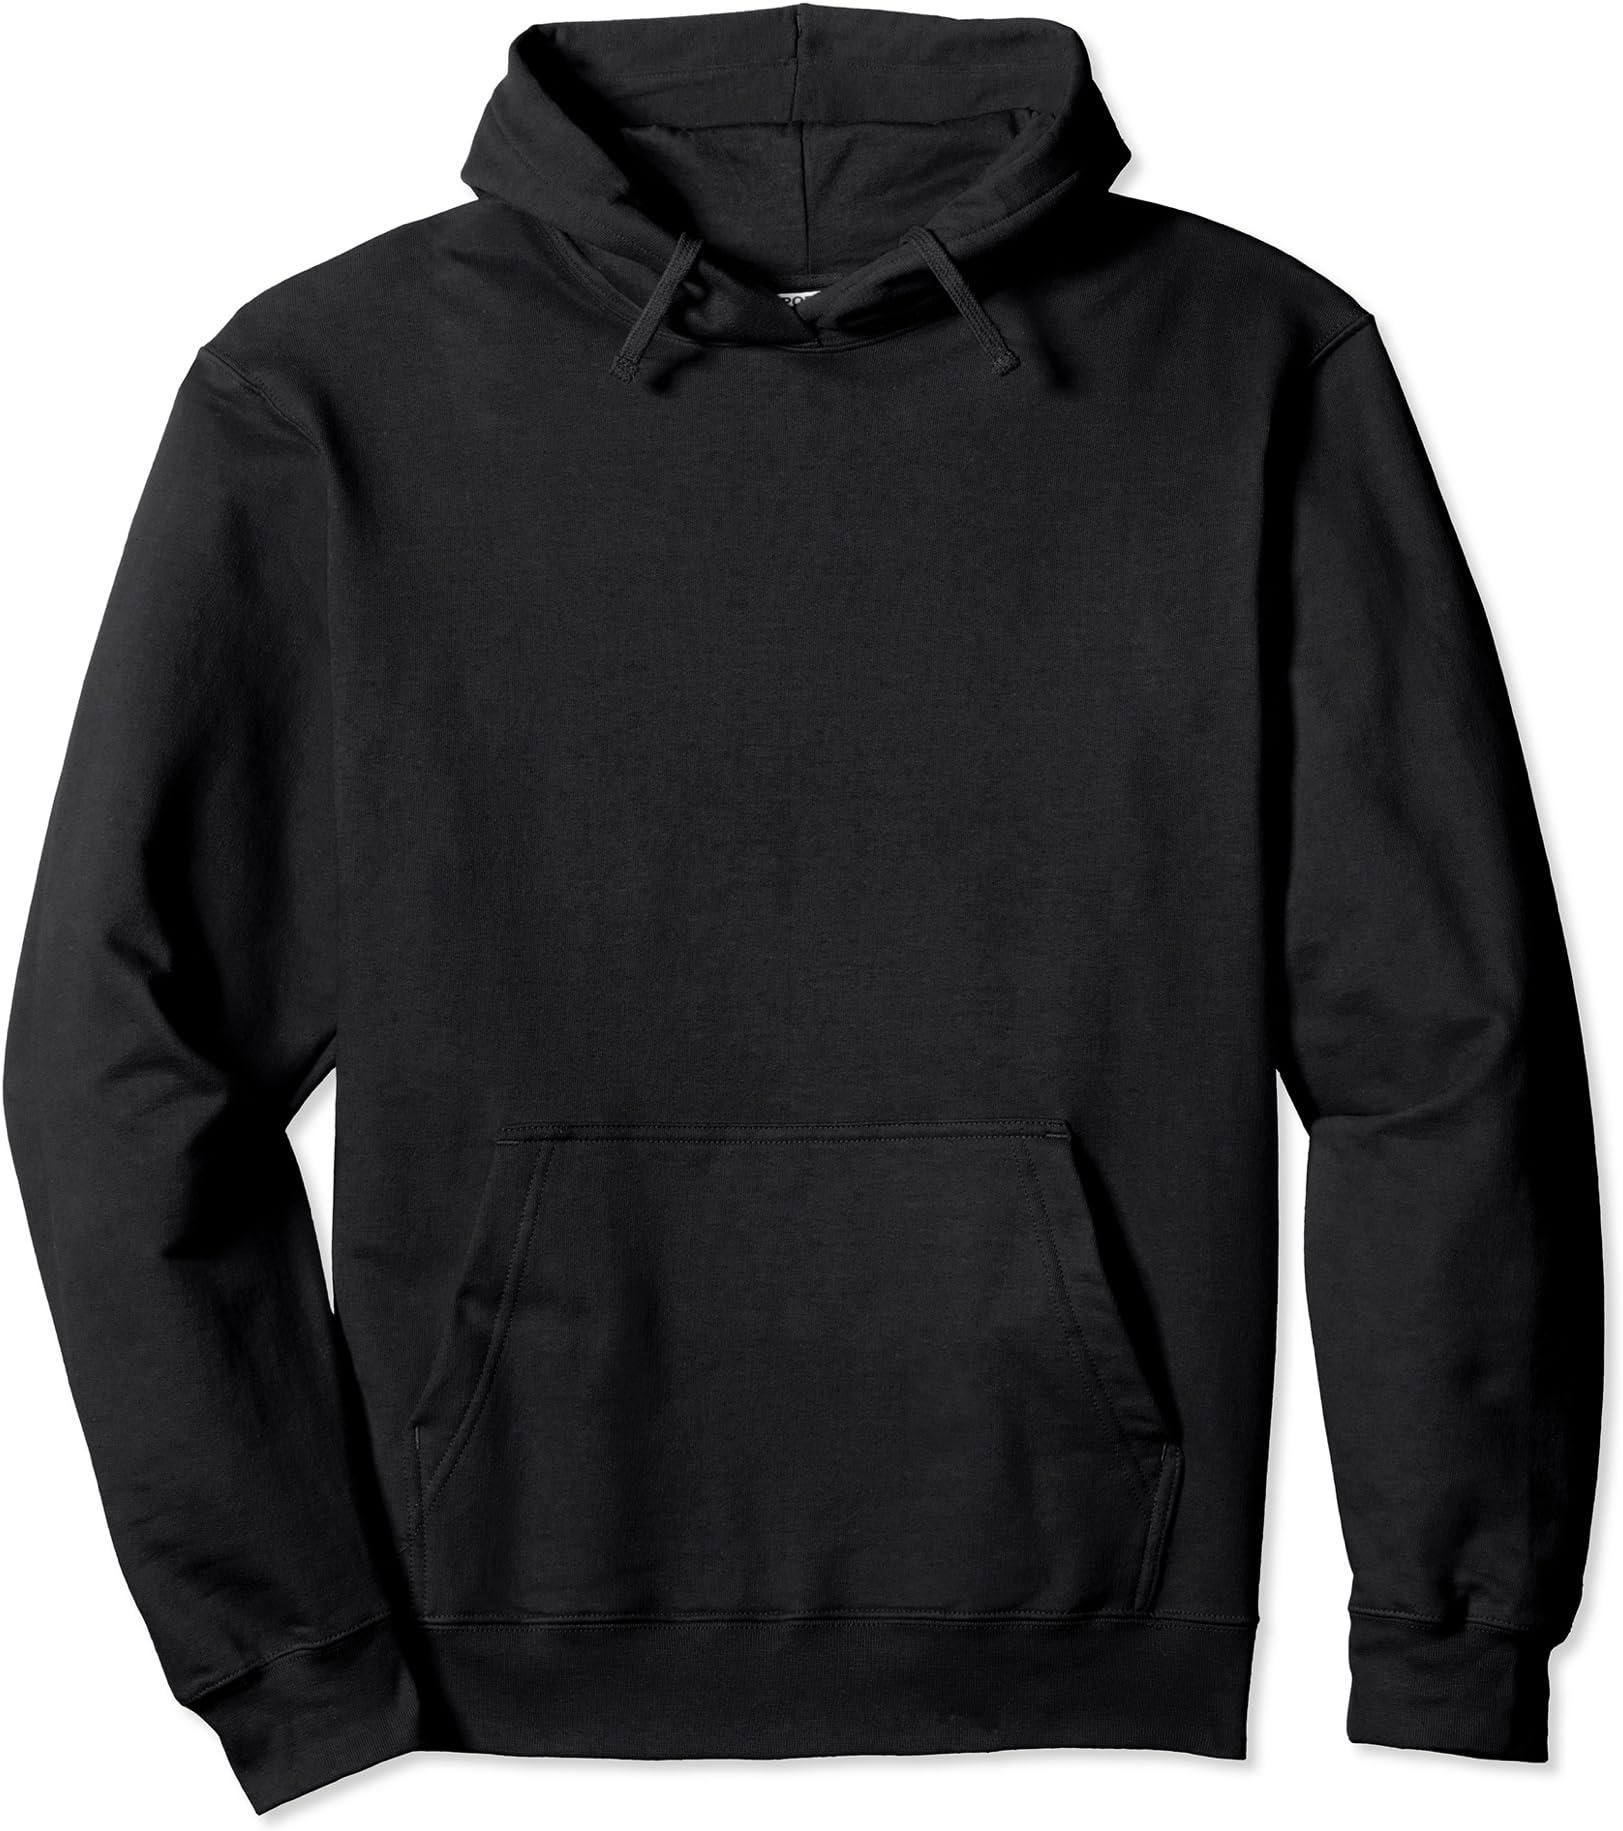 Its God He Says We Should Have Vintage Adult Hooded Sweatshirt